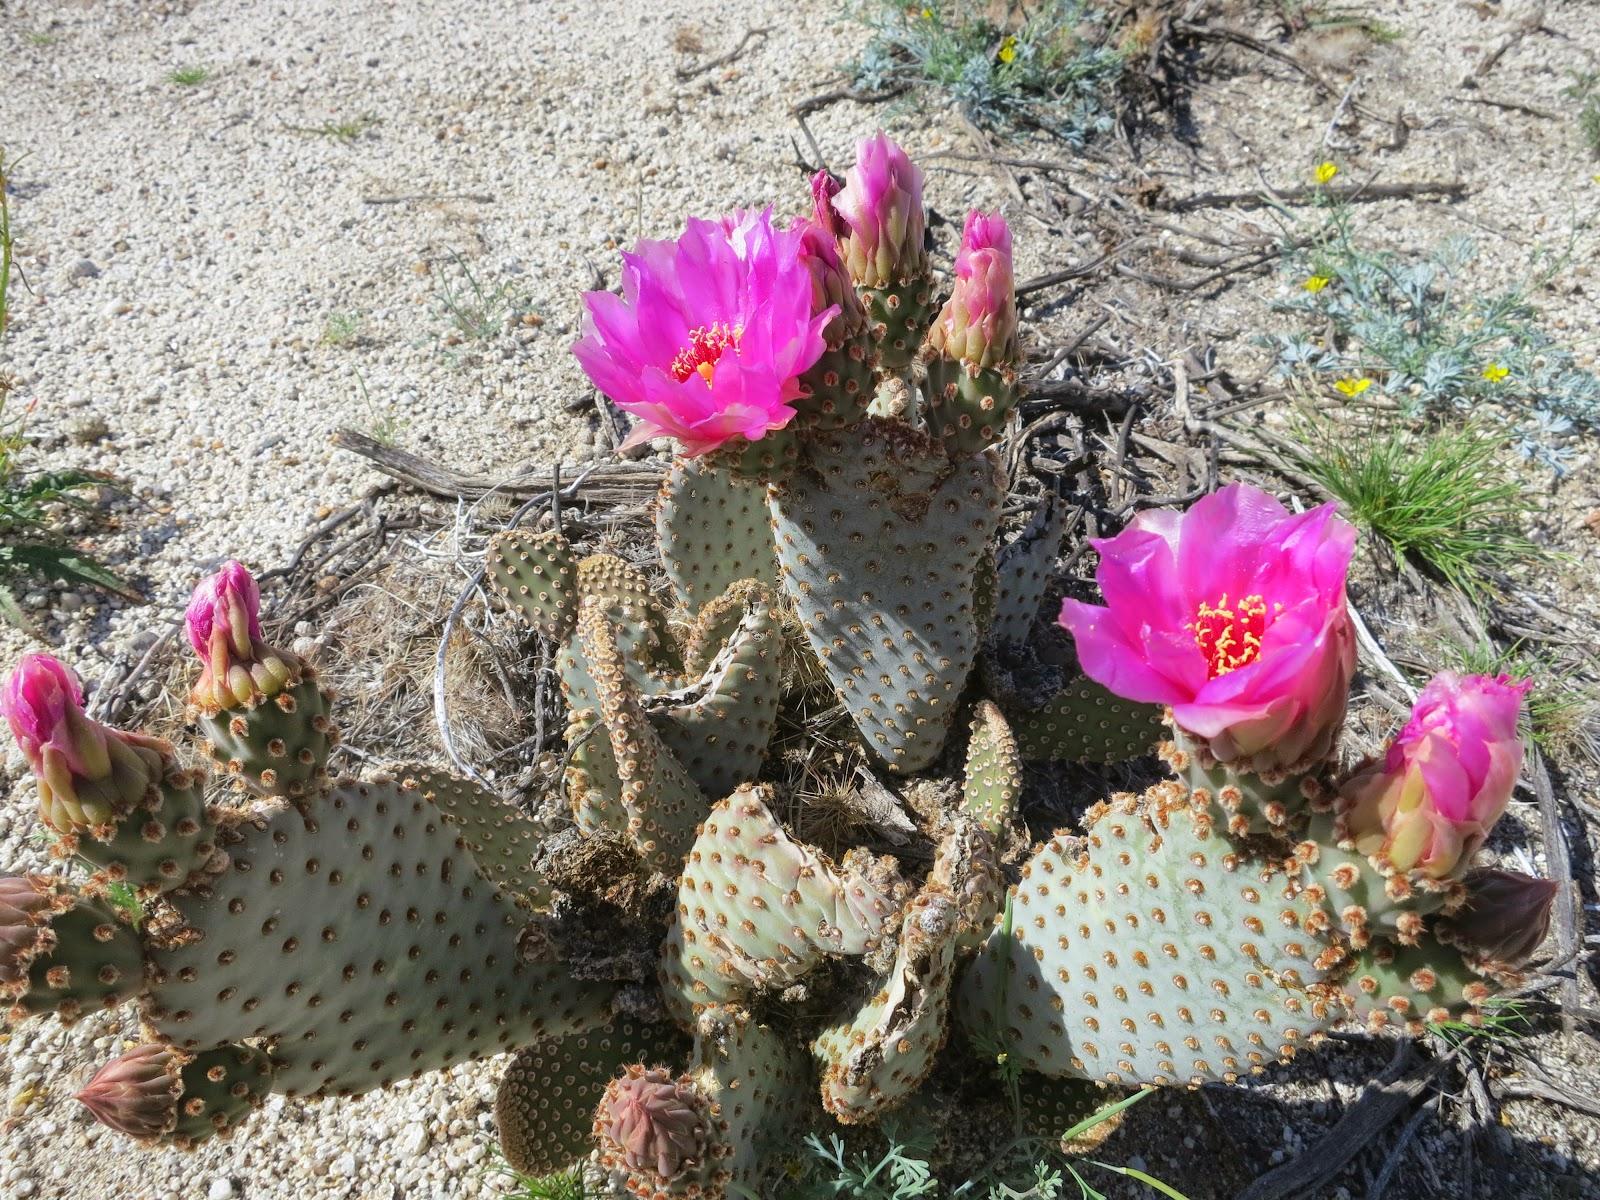 Beavertail Cactus with intense pink blooms